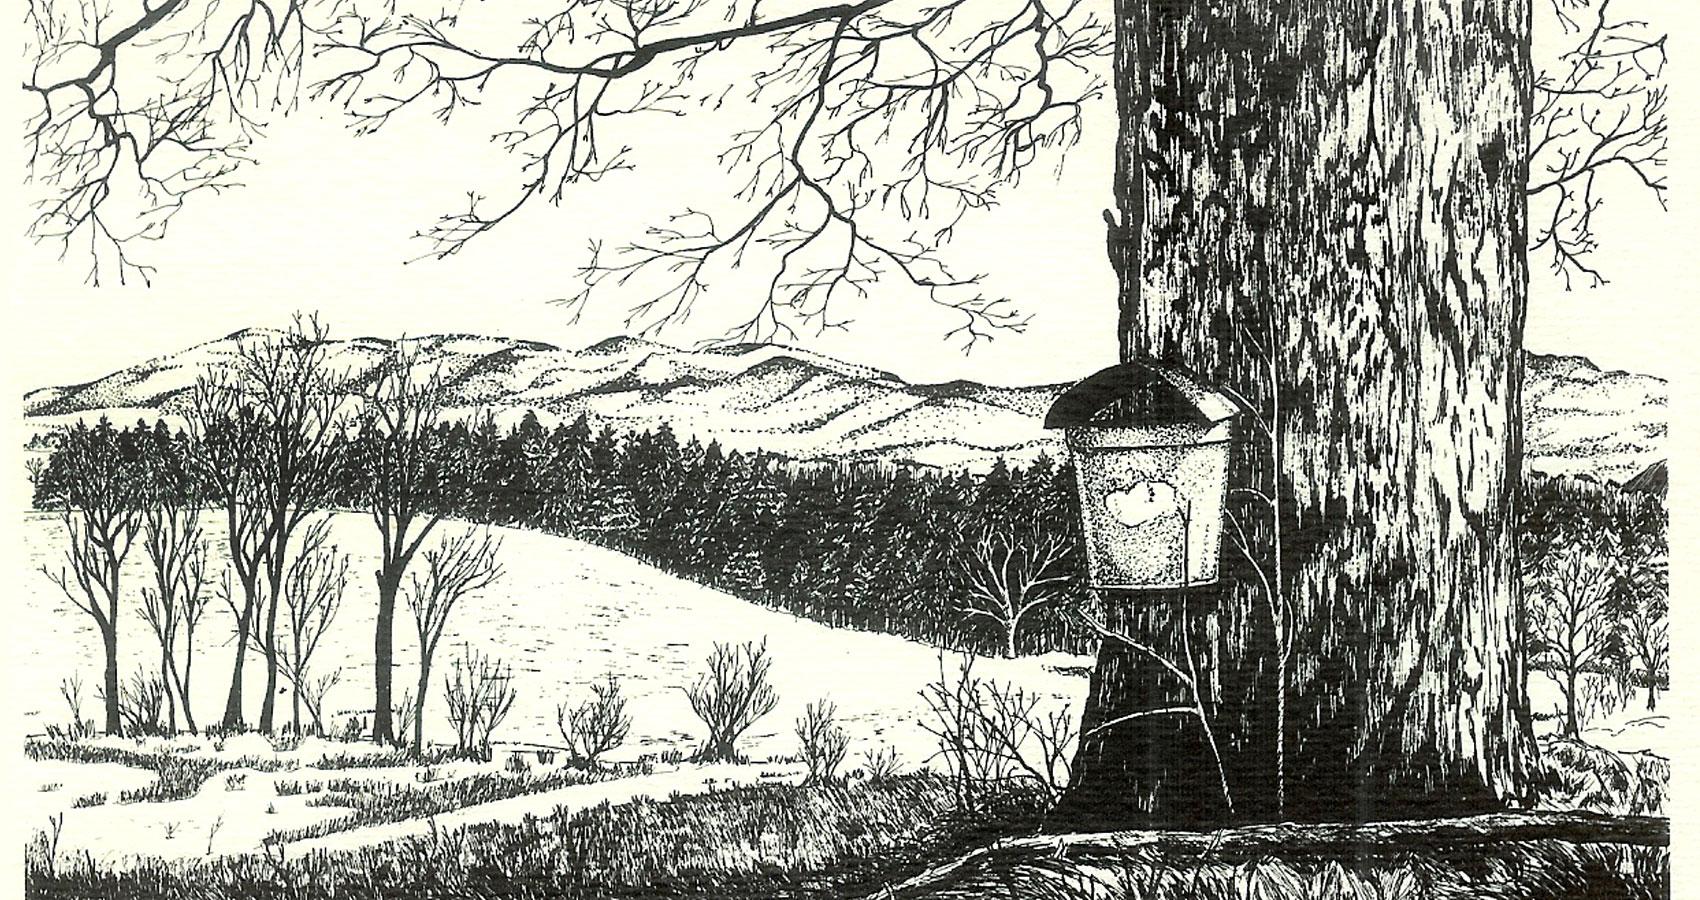 Winter written by Ann Christine Tabakaat Spillwords.com